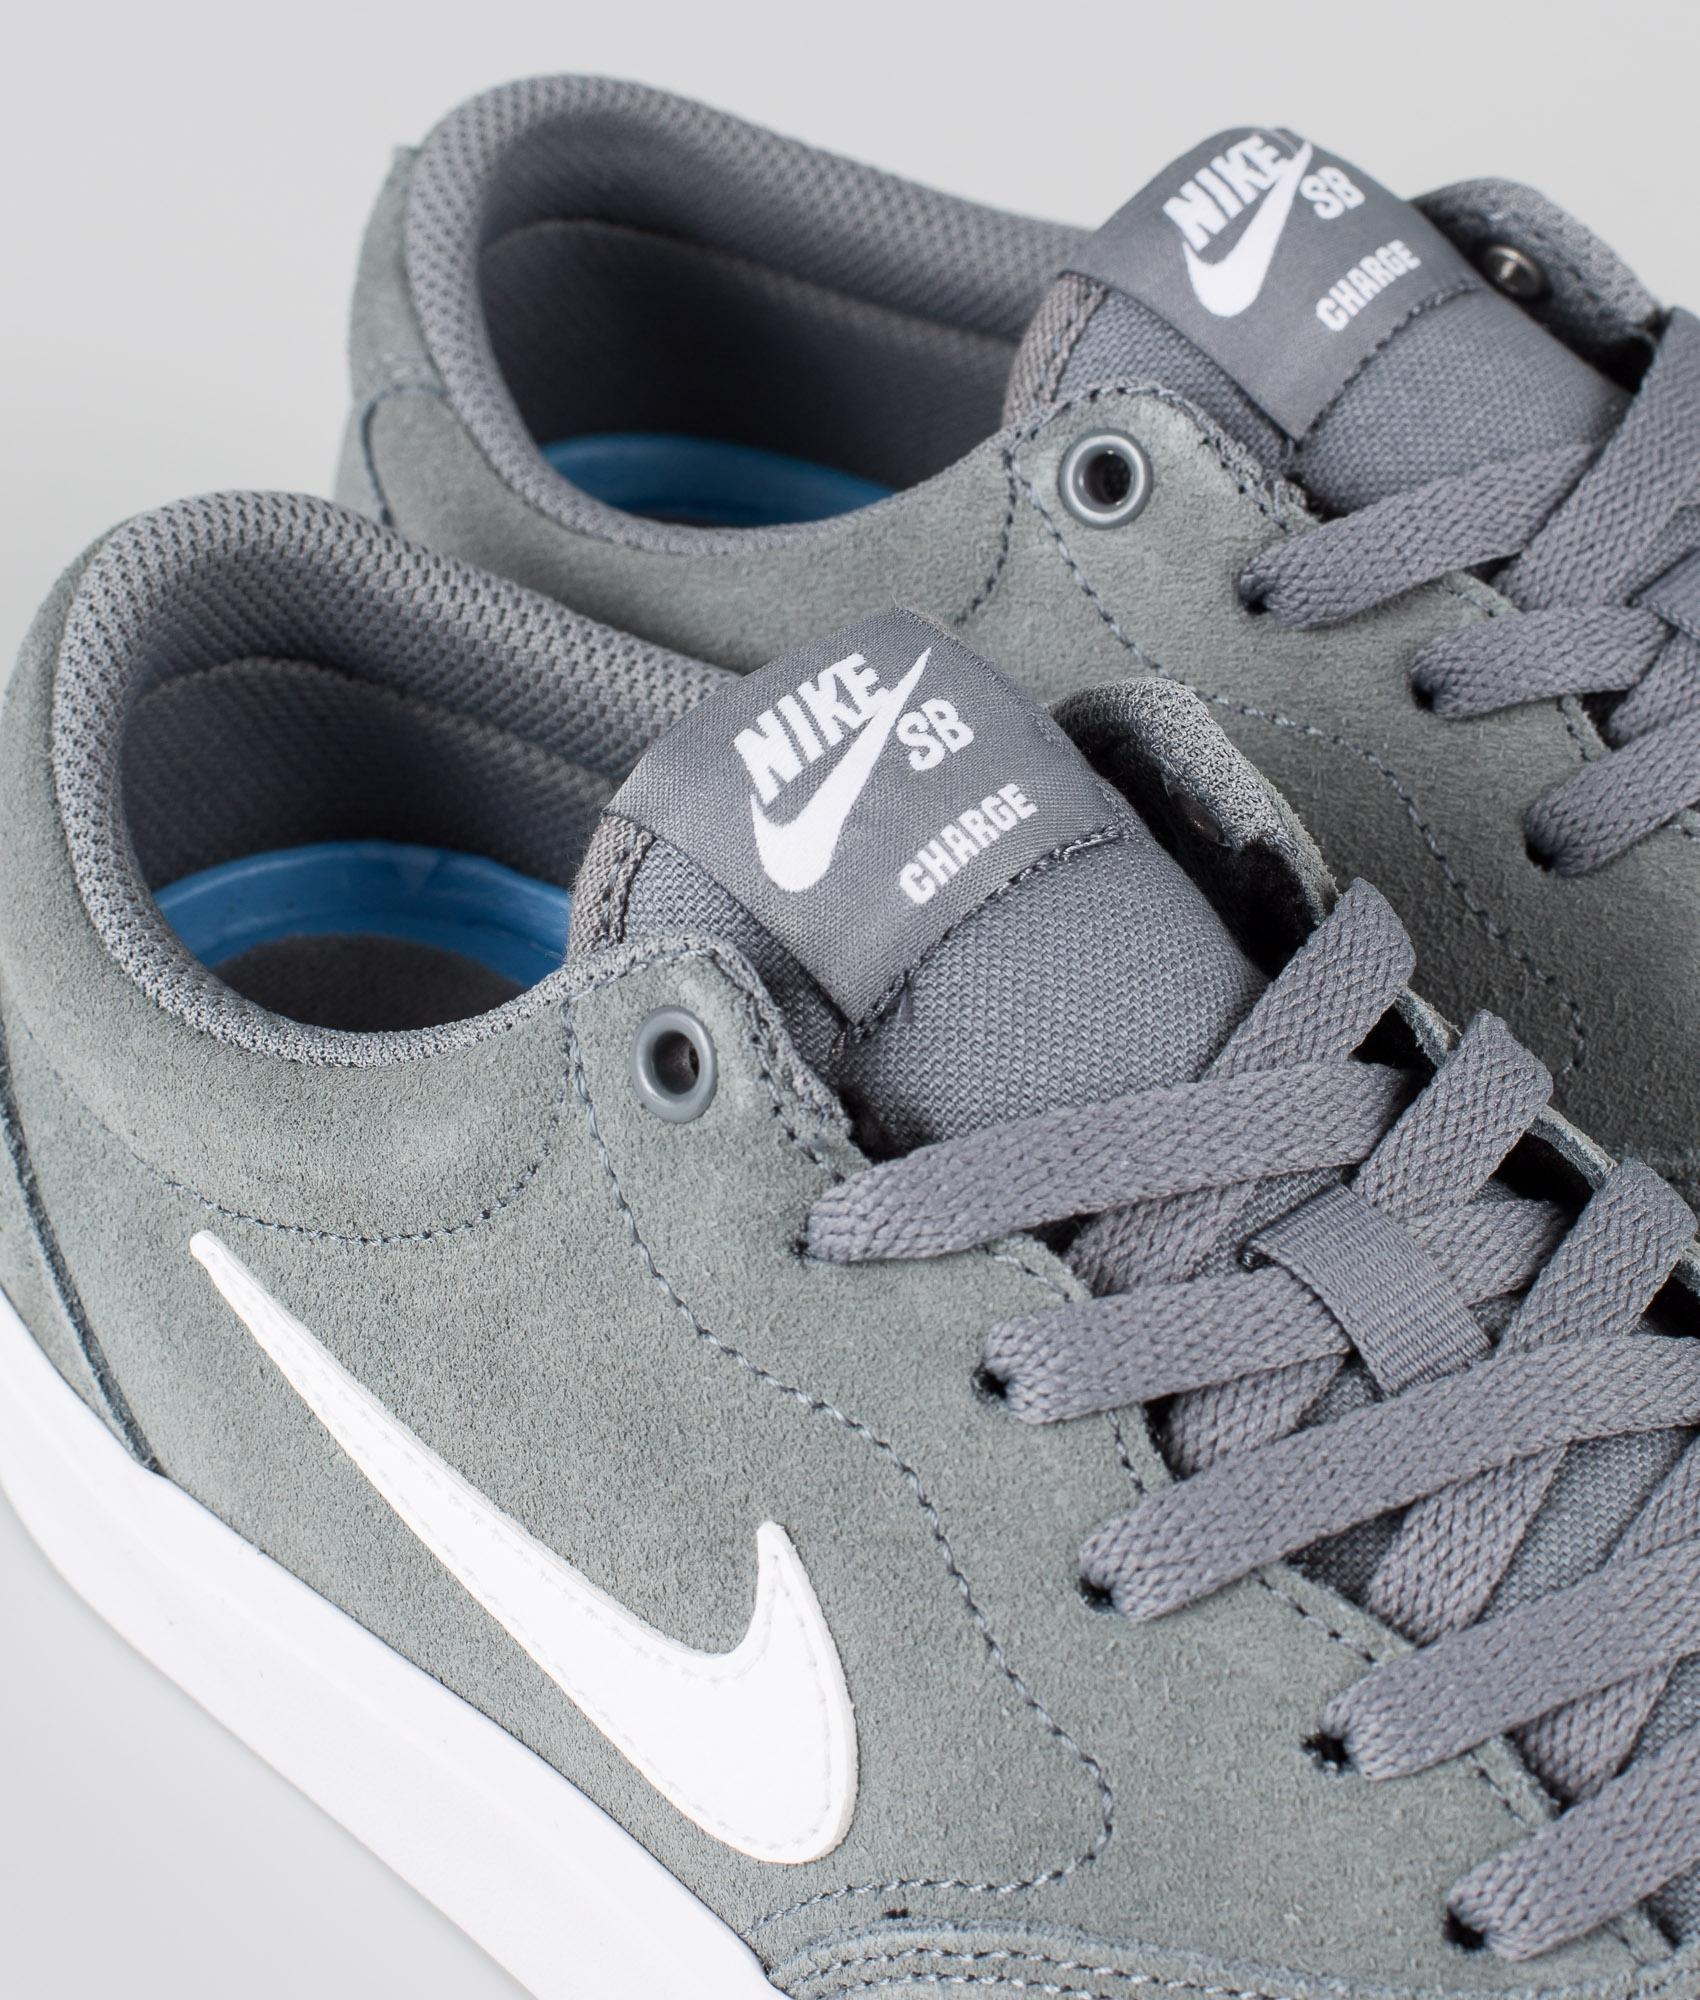 Nike SB Charge Suede Skor Cool GreyWhite Cool Grey White